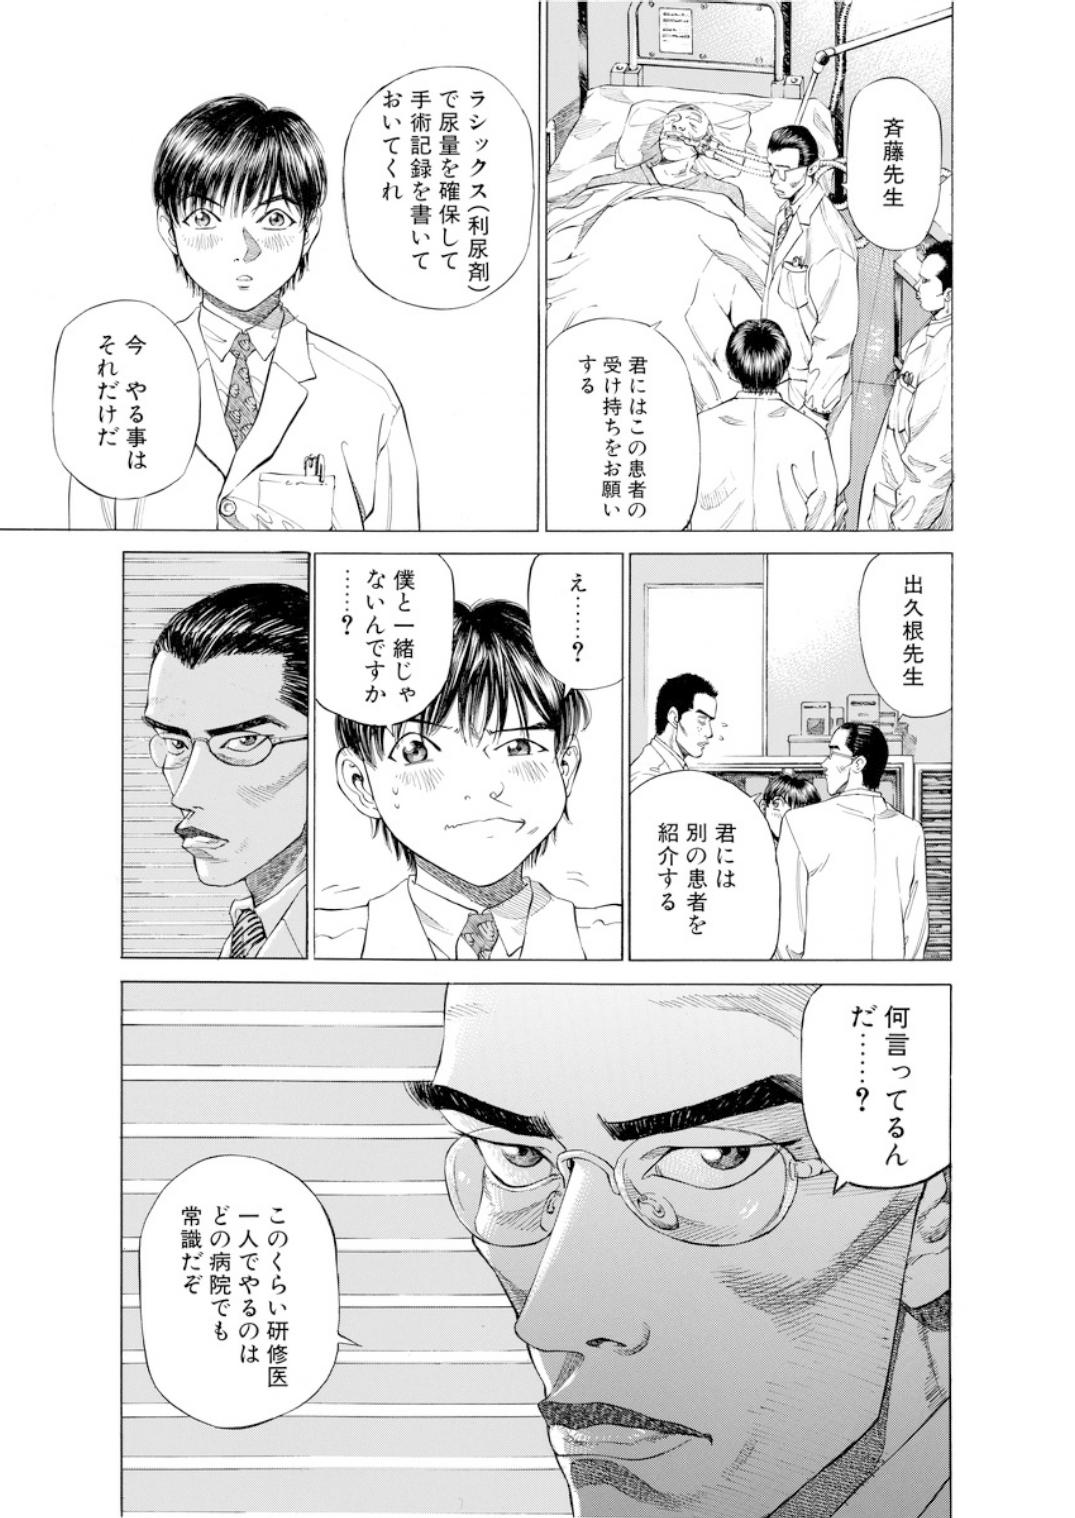 001bj_page-0081.jpg